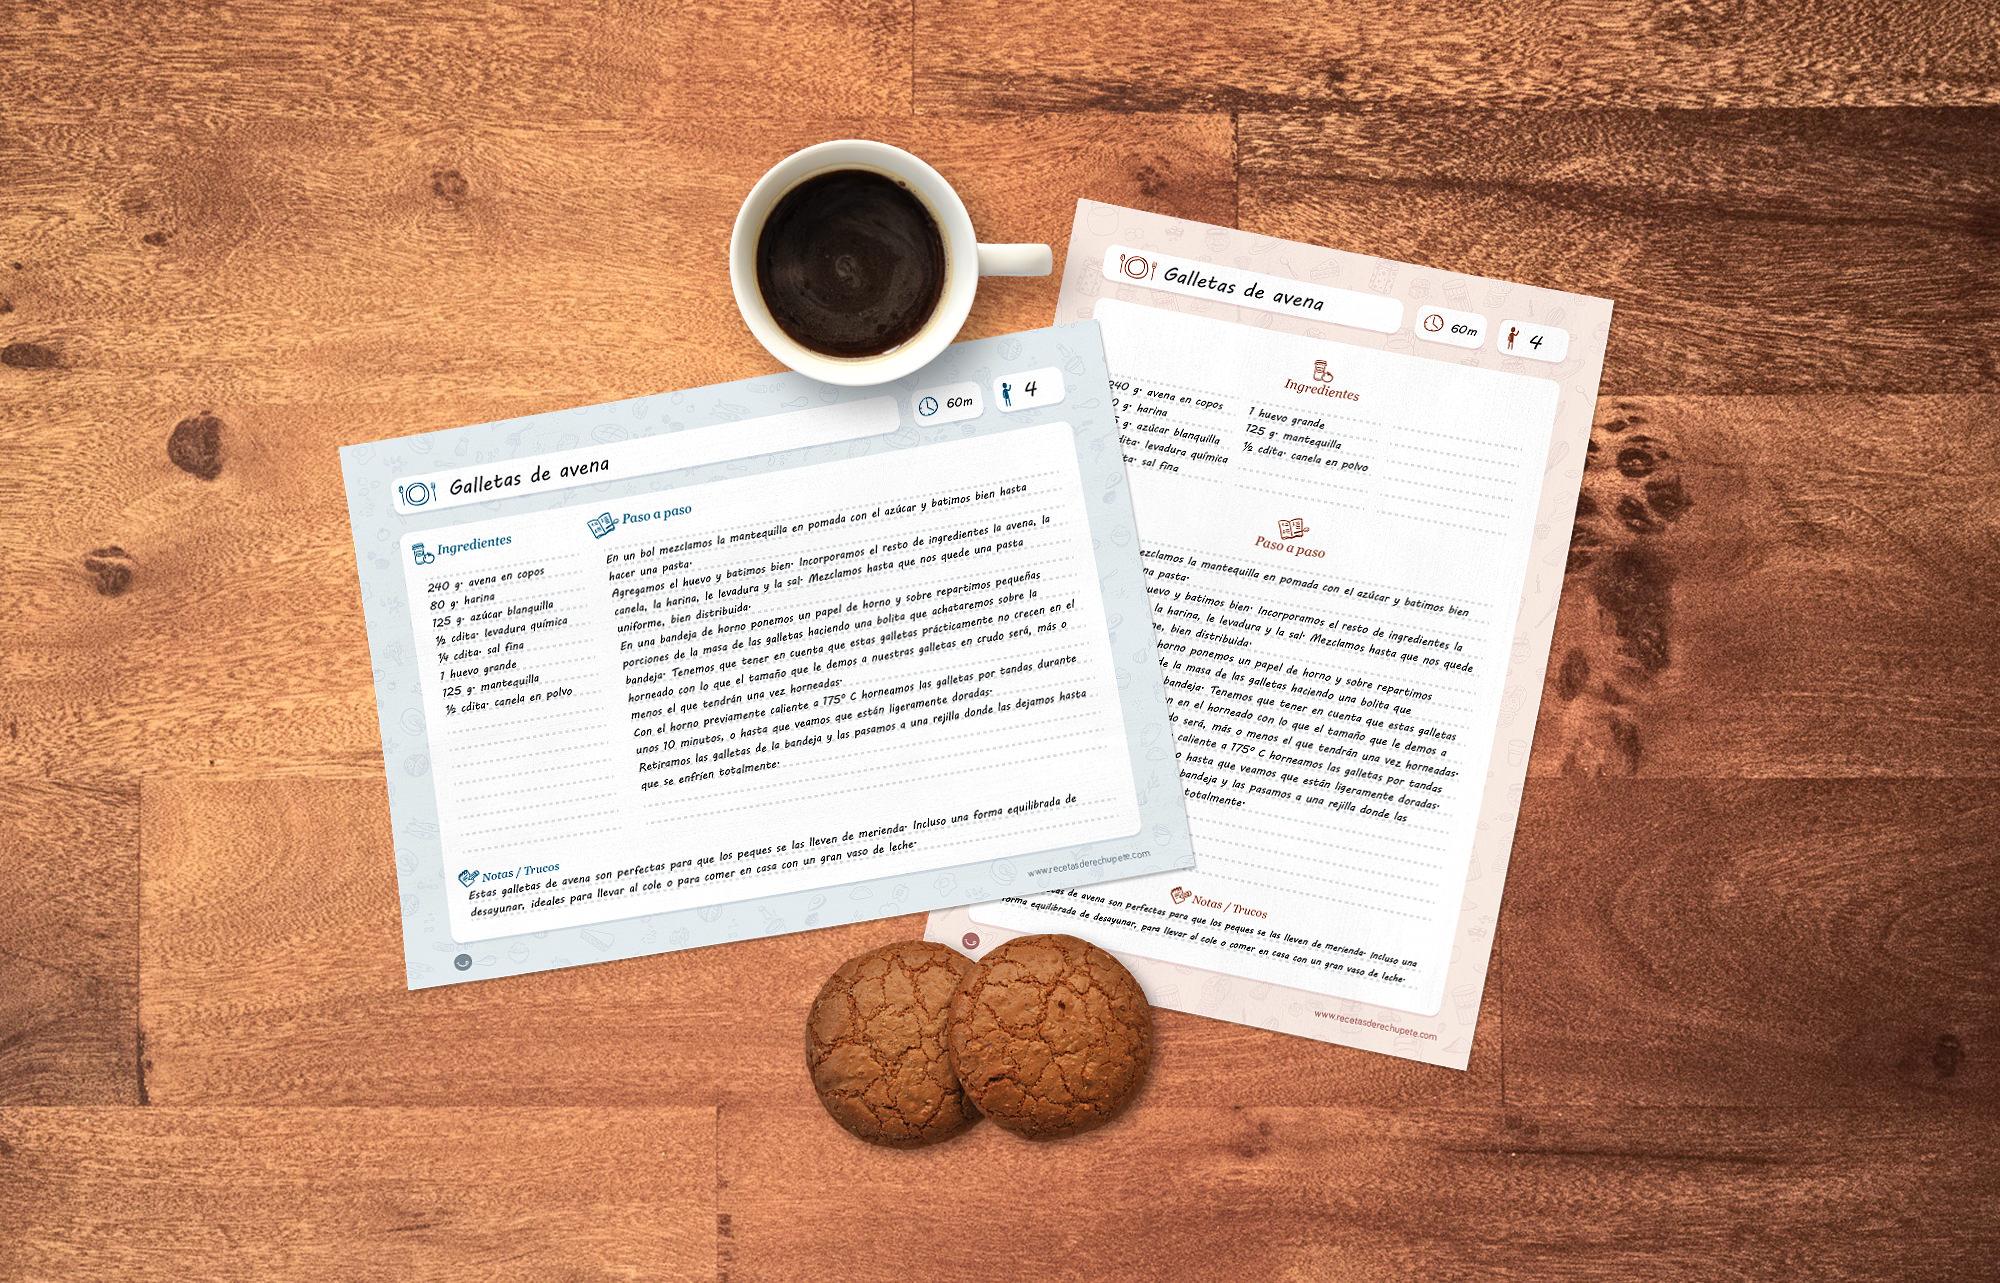 Plantillas gratis para escribir e imprimir recetas for Plantillas de cocina